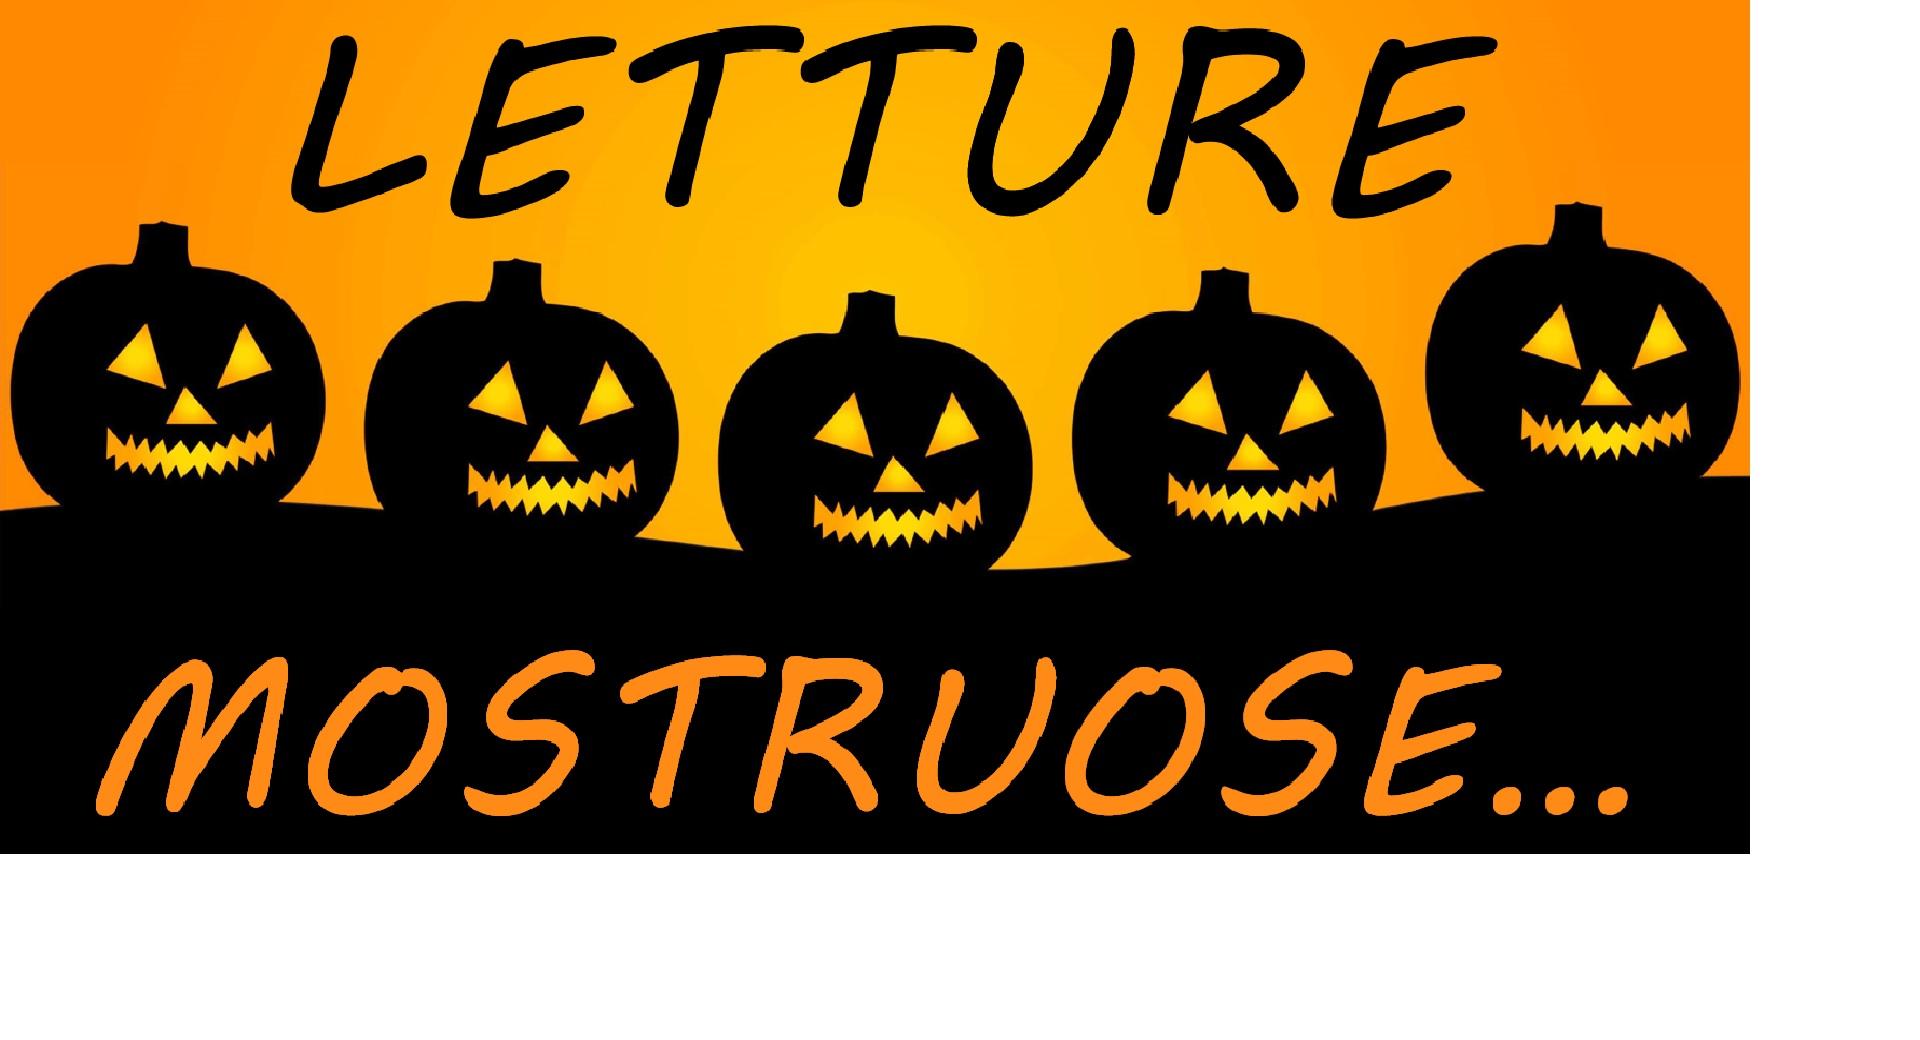 Data Di Halloween.Halloween Letture Mostruose